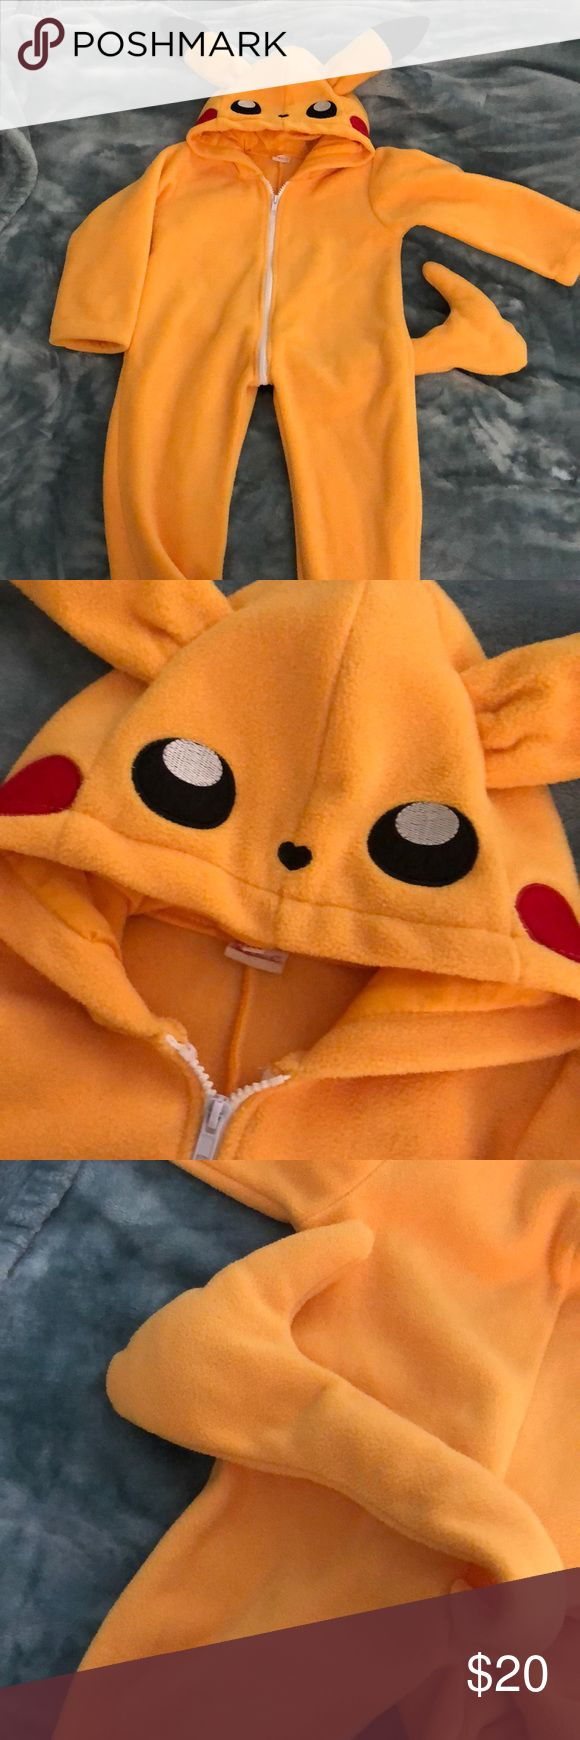 Pikachu costume Custom-made Pikachu costume. Very good ...